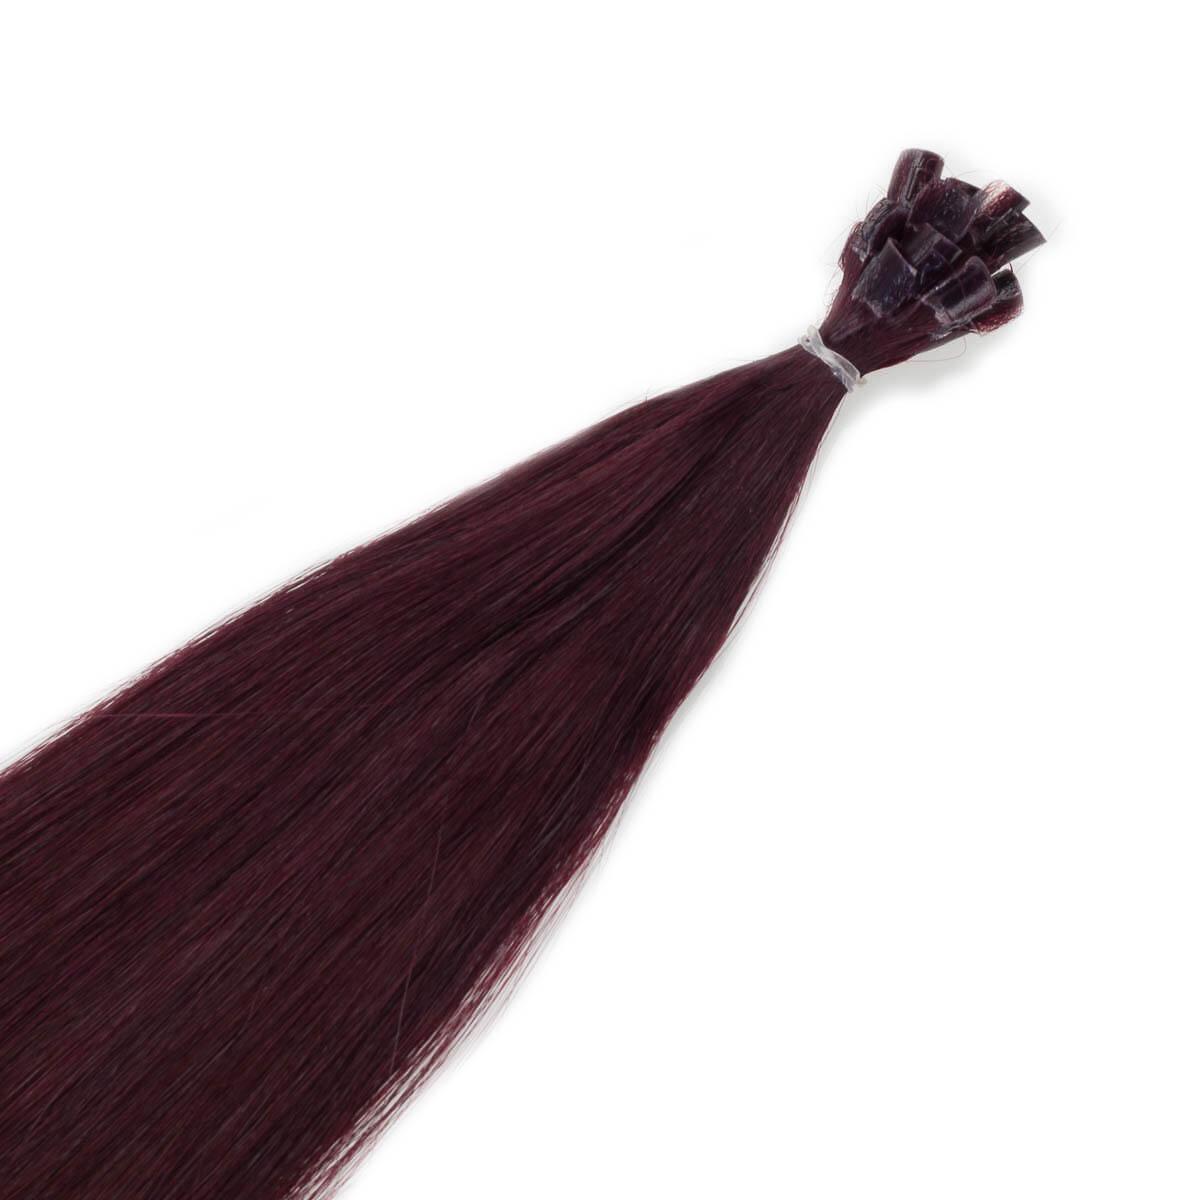 Nail Hair Premium 6.12 Dark Mahogany Brown 40 cm